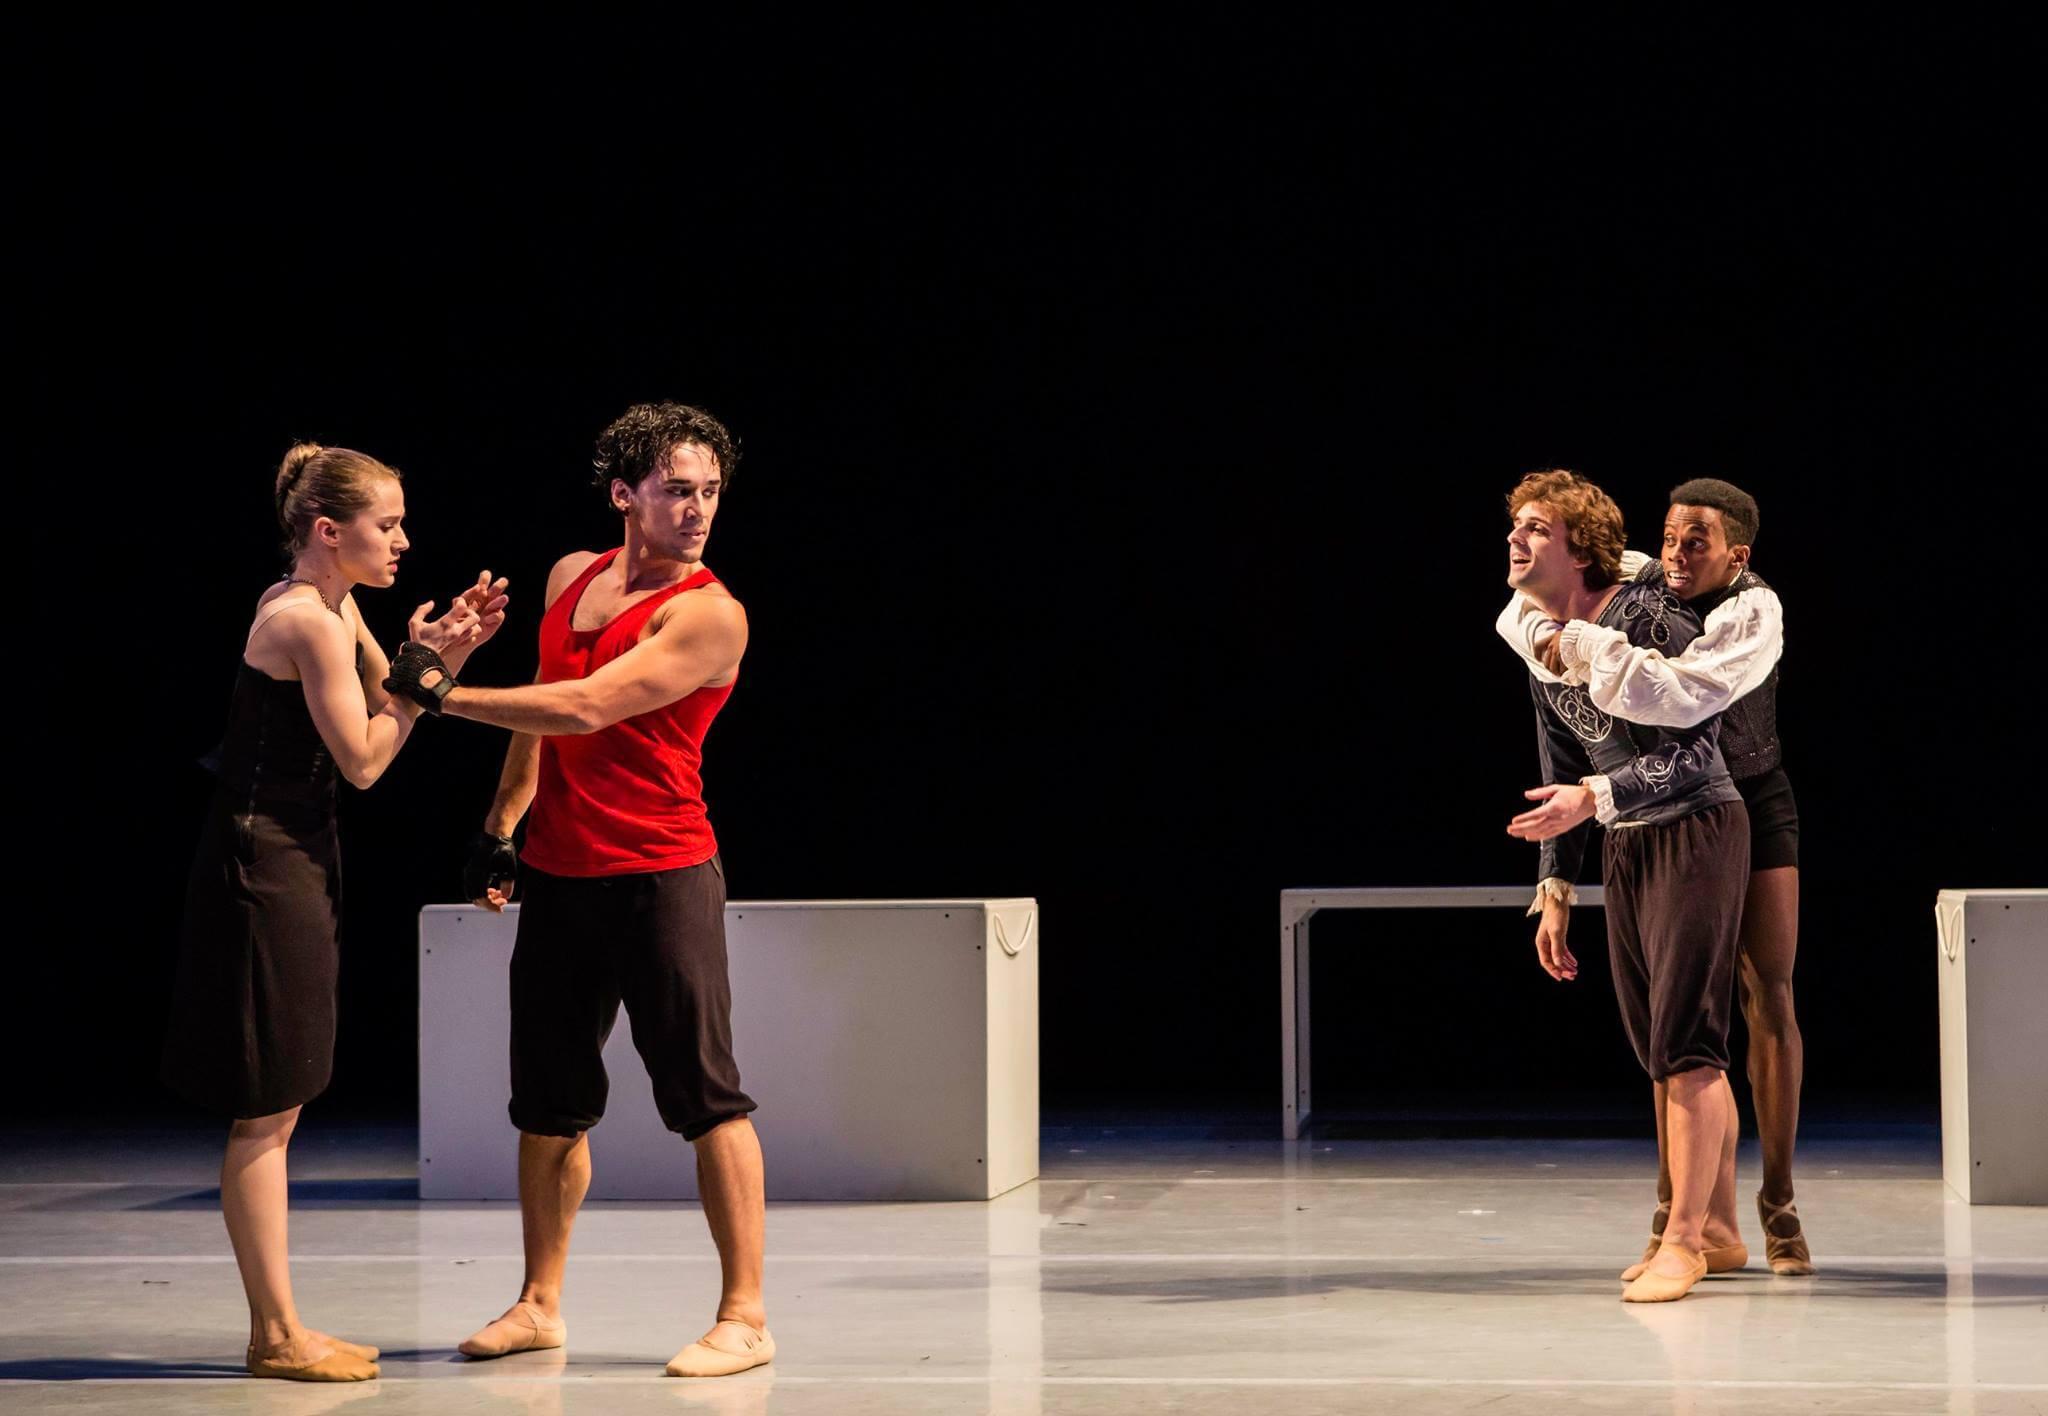 Romeo And Juliet, Ballet Ireland, Choreography Morgann Runacre Temple, Lighting Zia Bergin Holly (1)